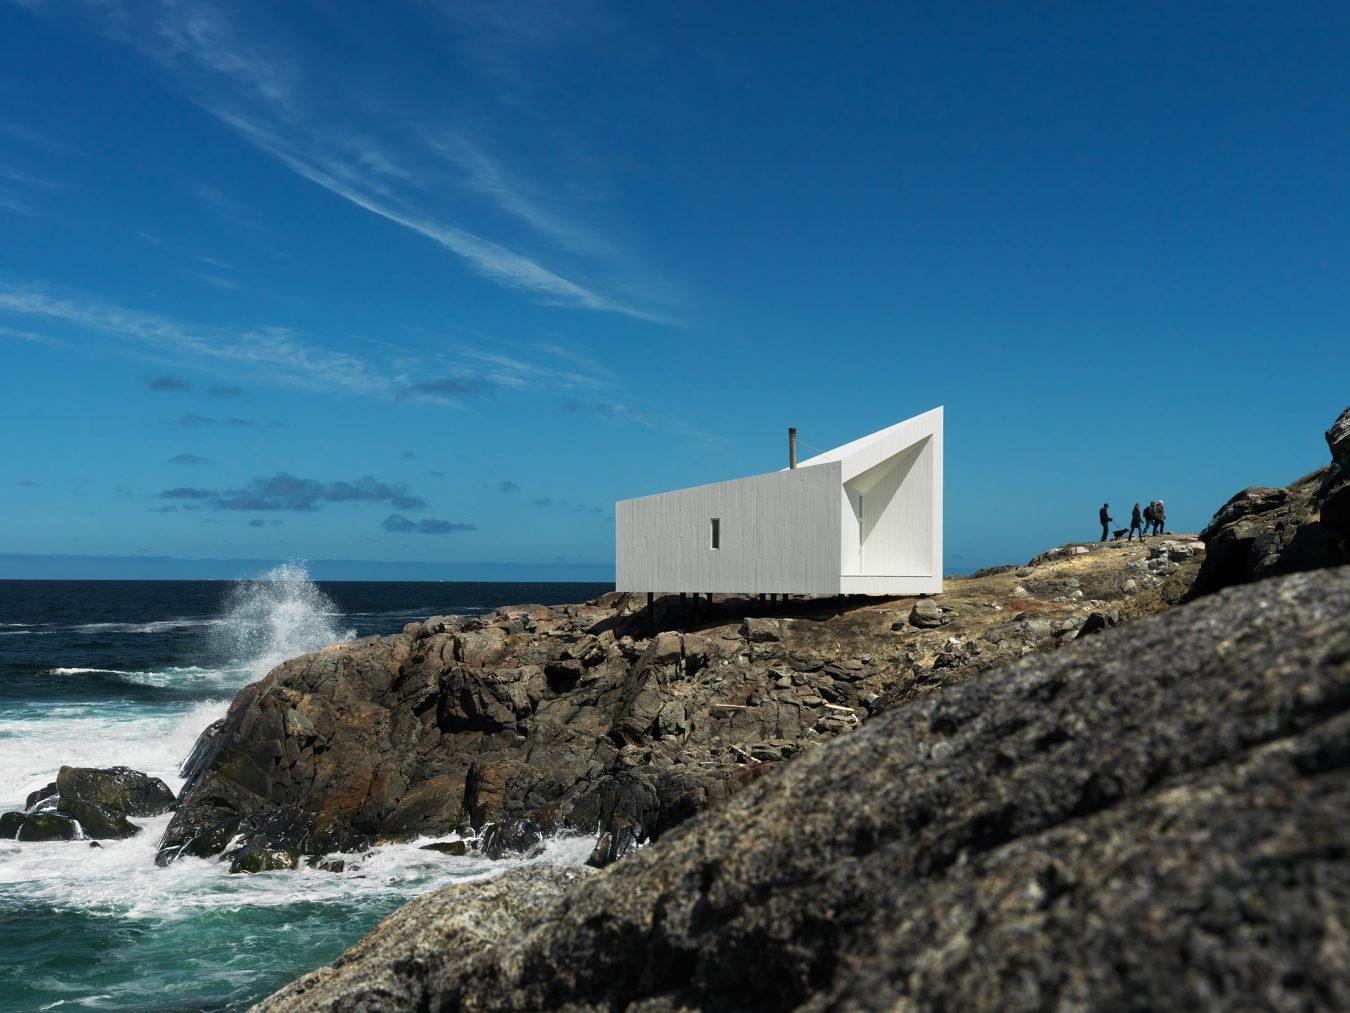 Stunning Minimalist Architecture that Blends Craftmanship and Nature